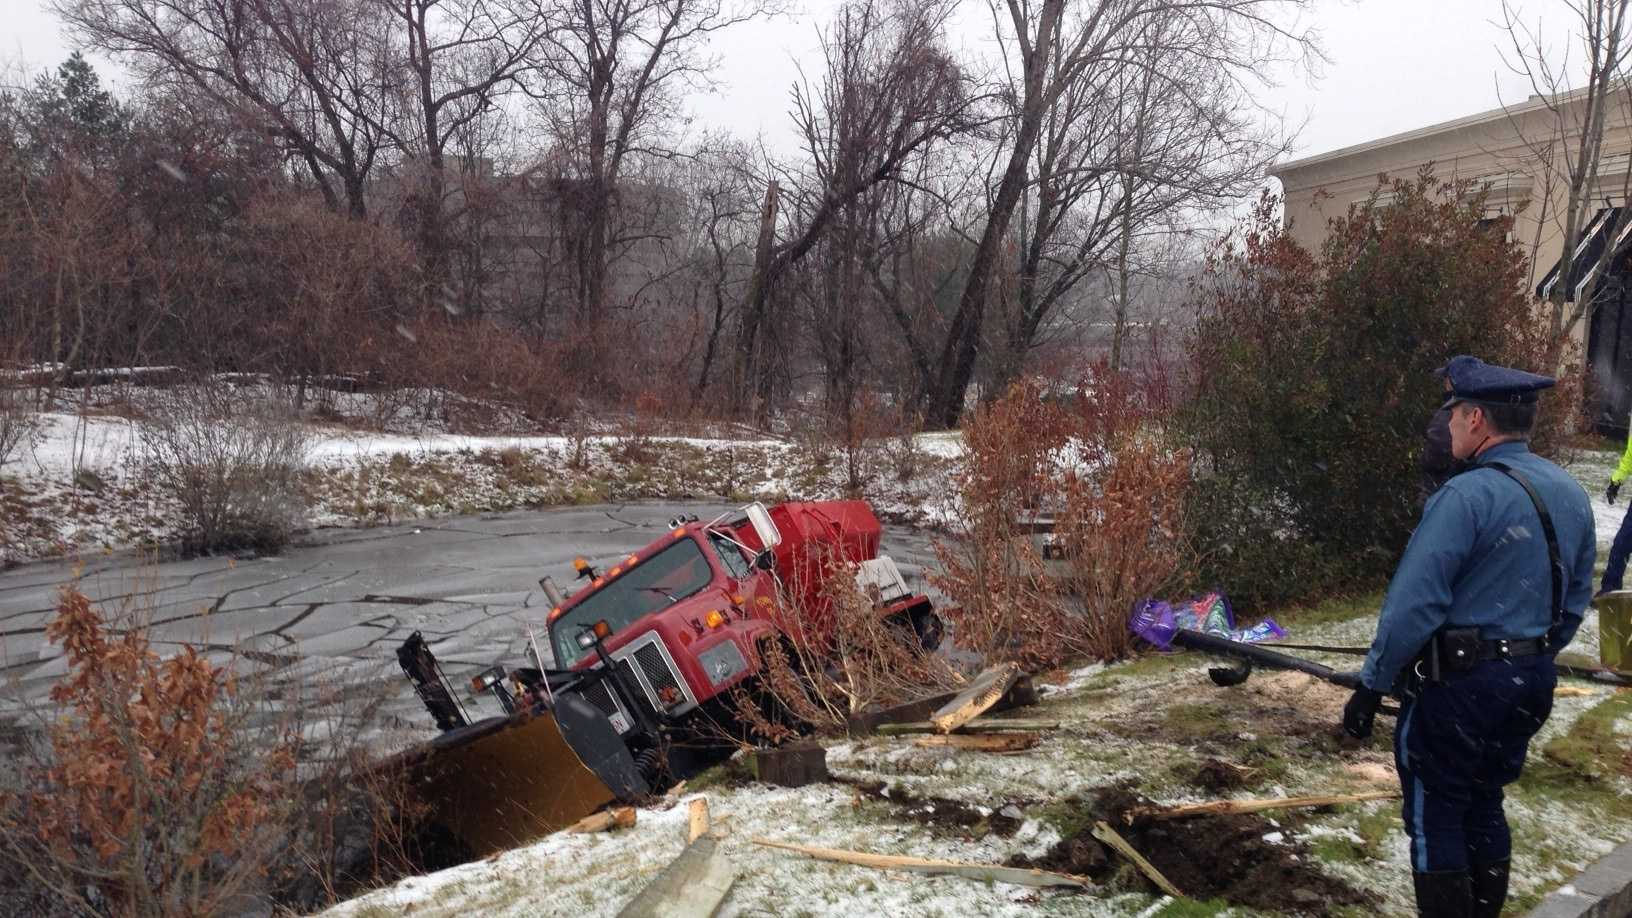 Sander plow crash